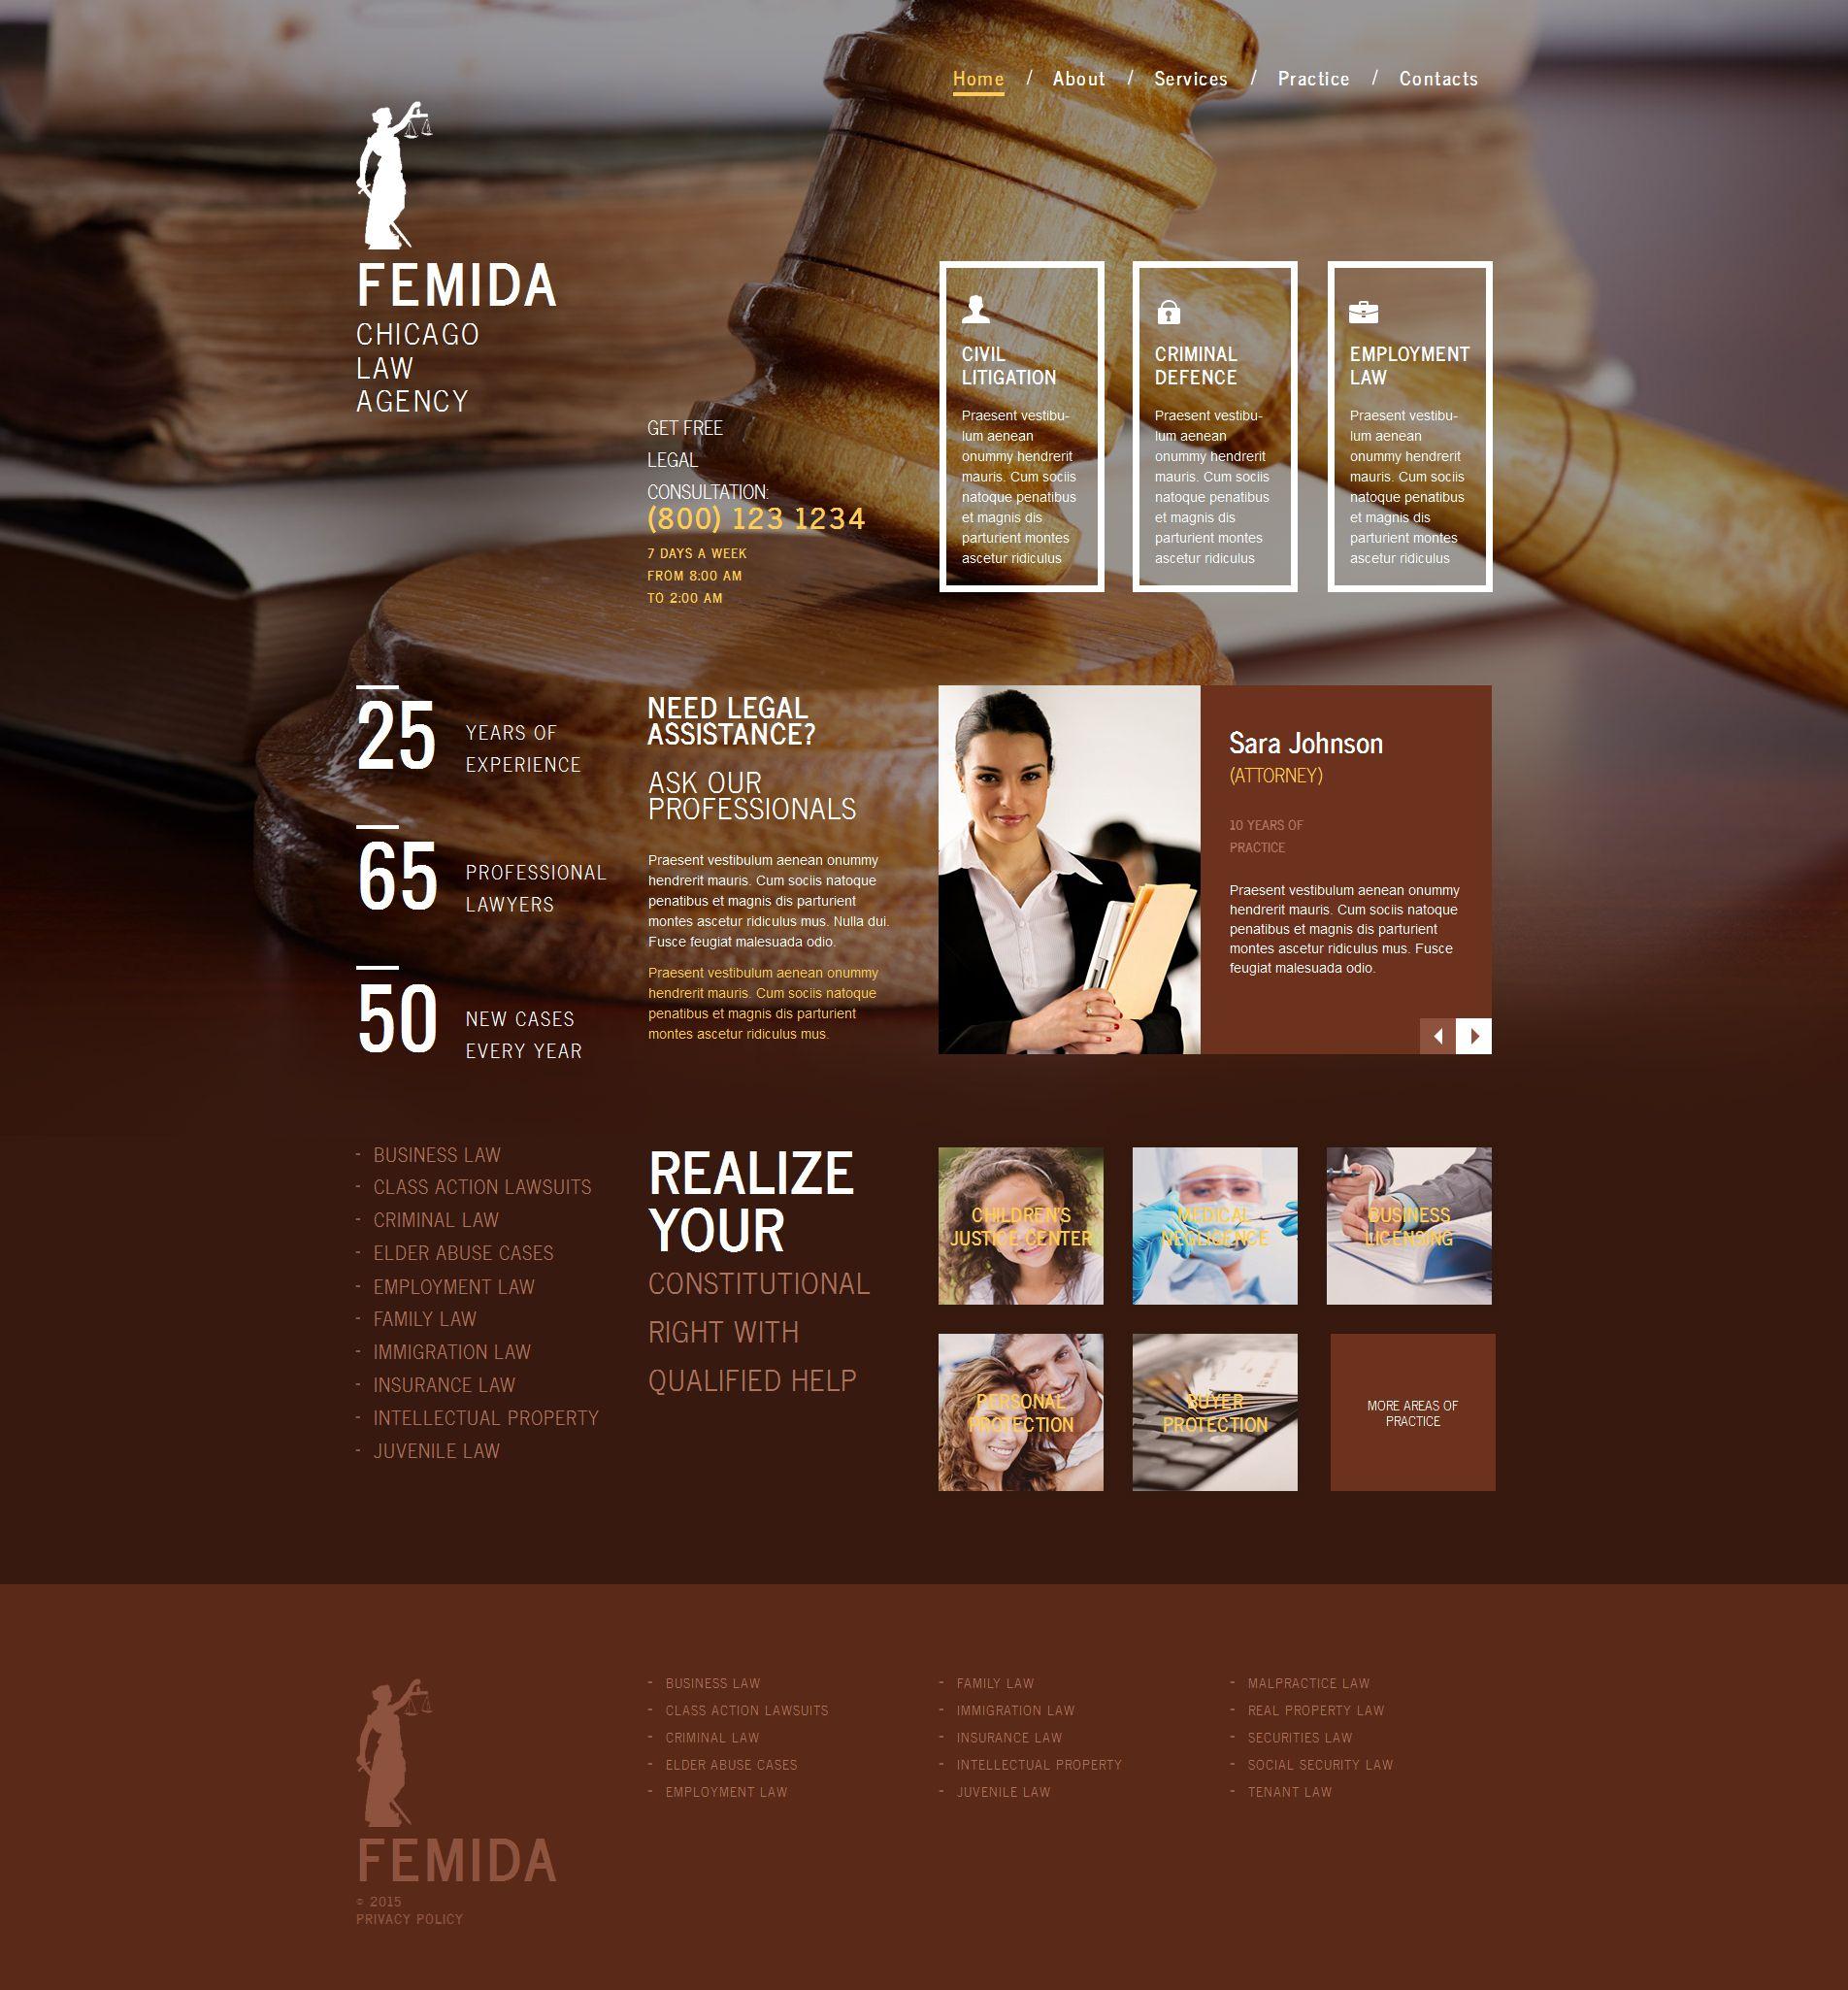 Law Firm Moto CMS HTML Template - screenshot